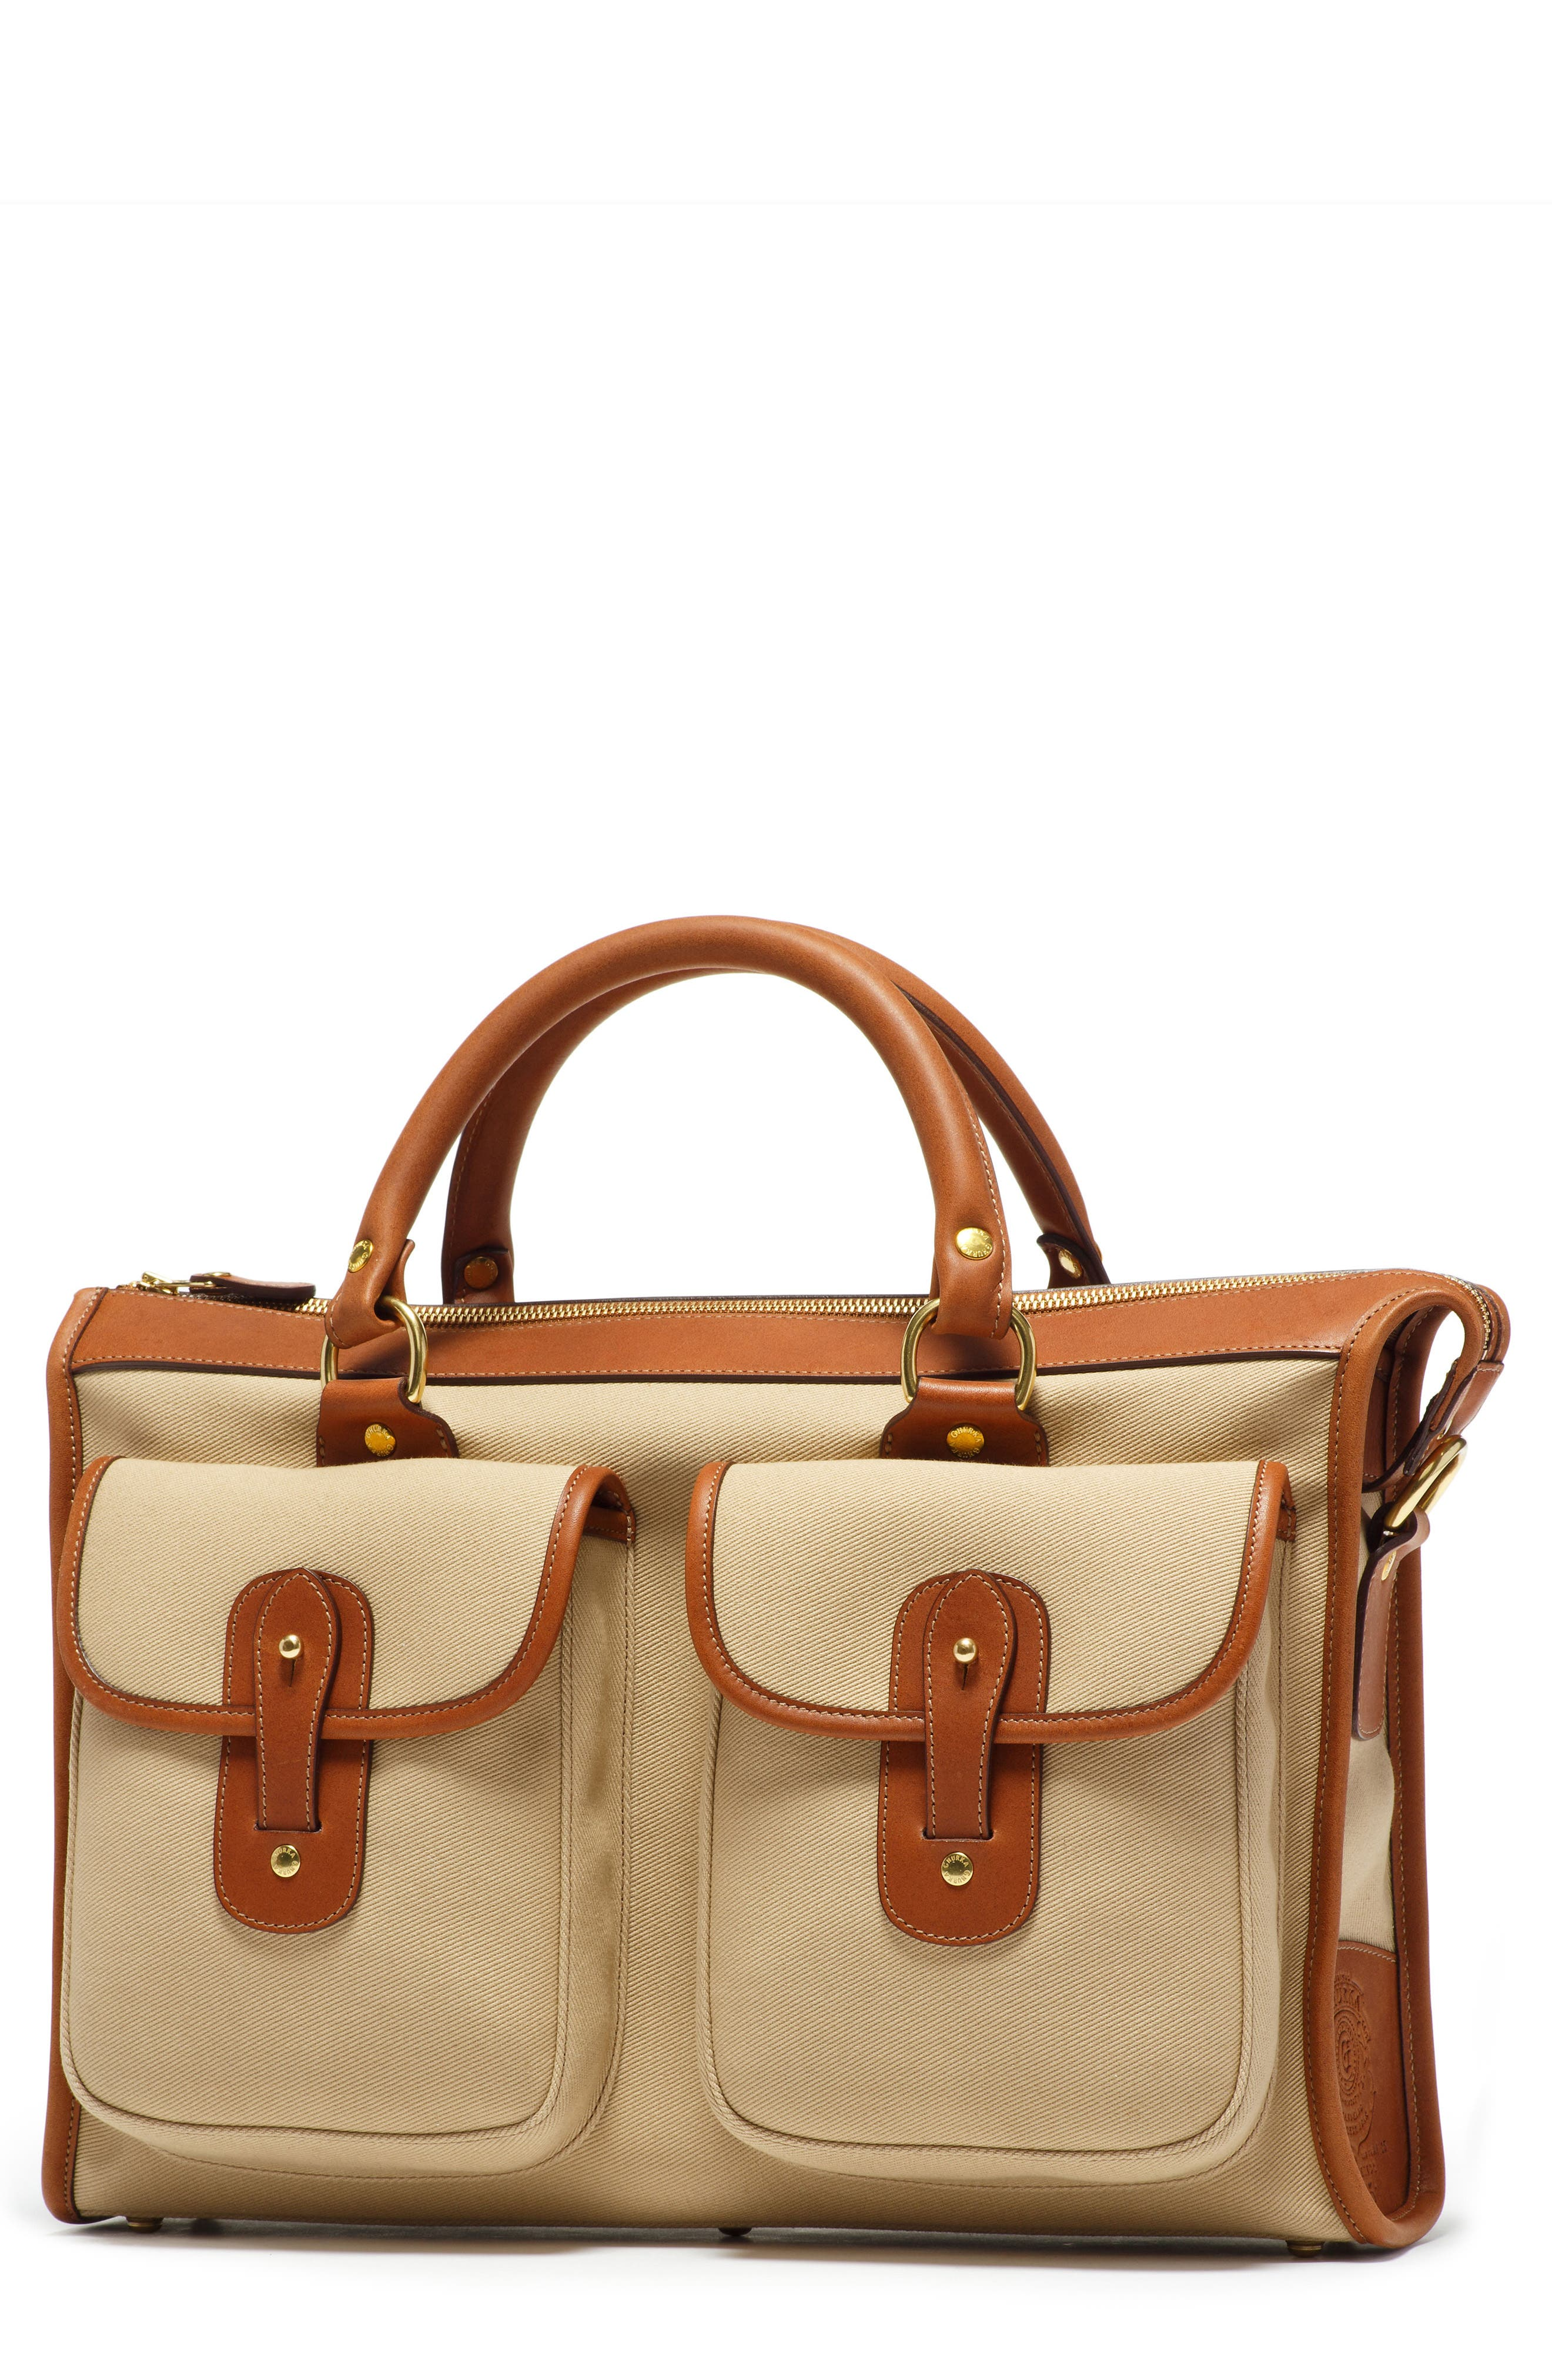 GHURKA Examiner Briefcase